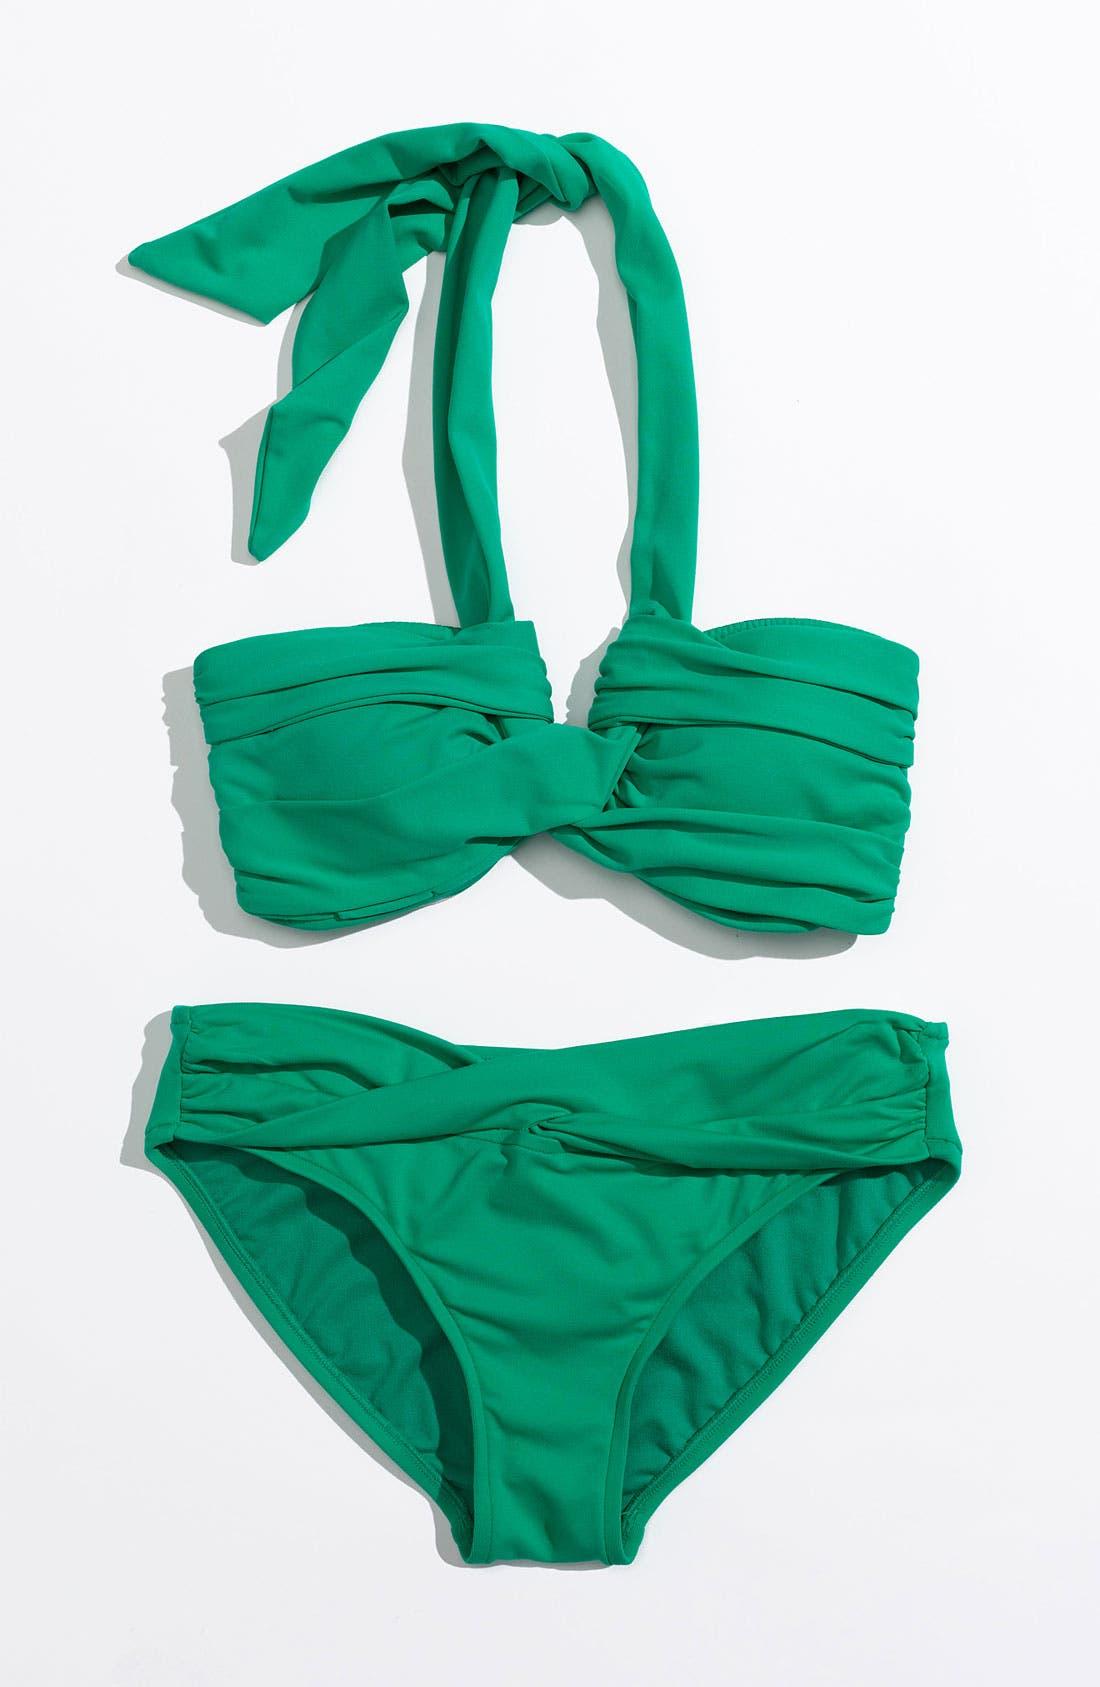 Alternate Image 1 Selected - Seafolly Bikini Top & Bottoms